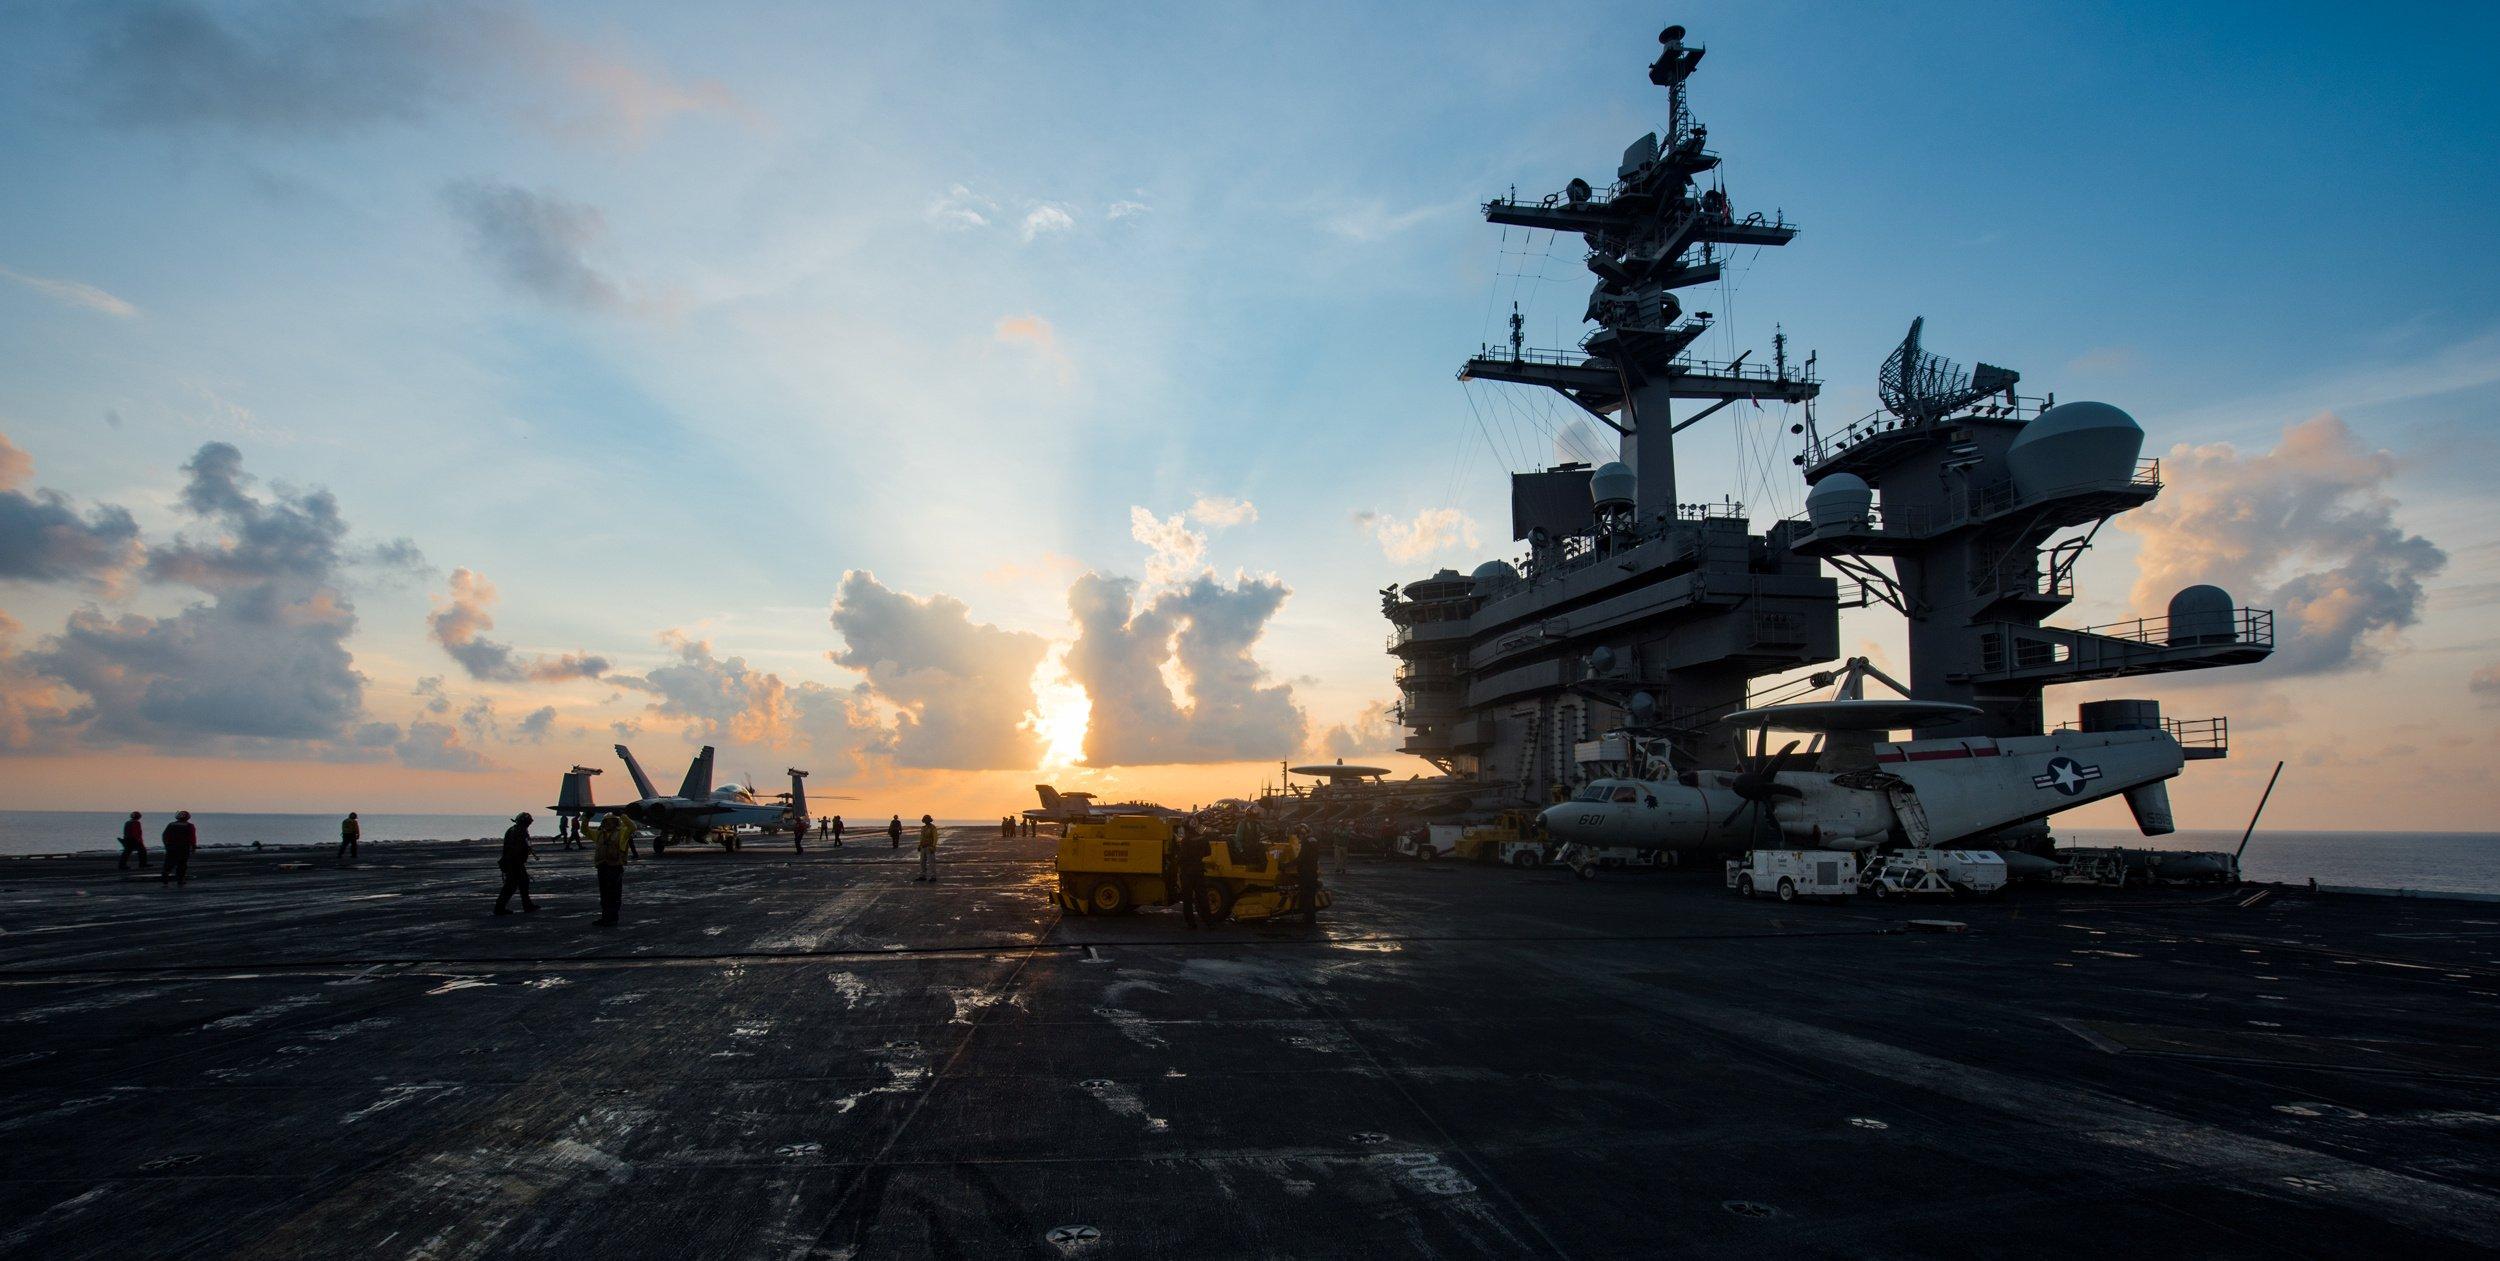 The aircraft carrier USS Carl Vinson